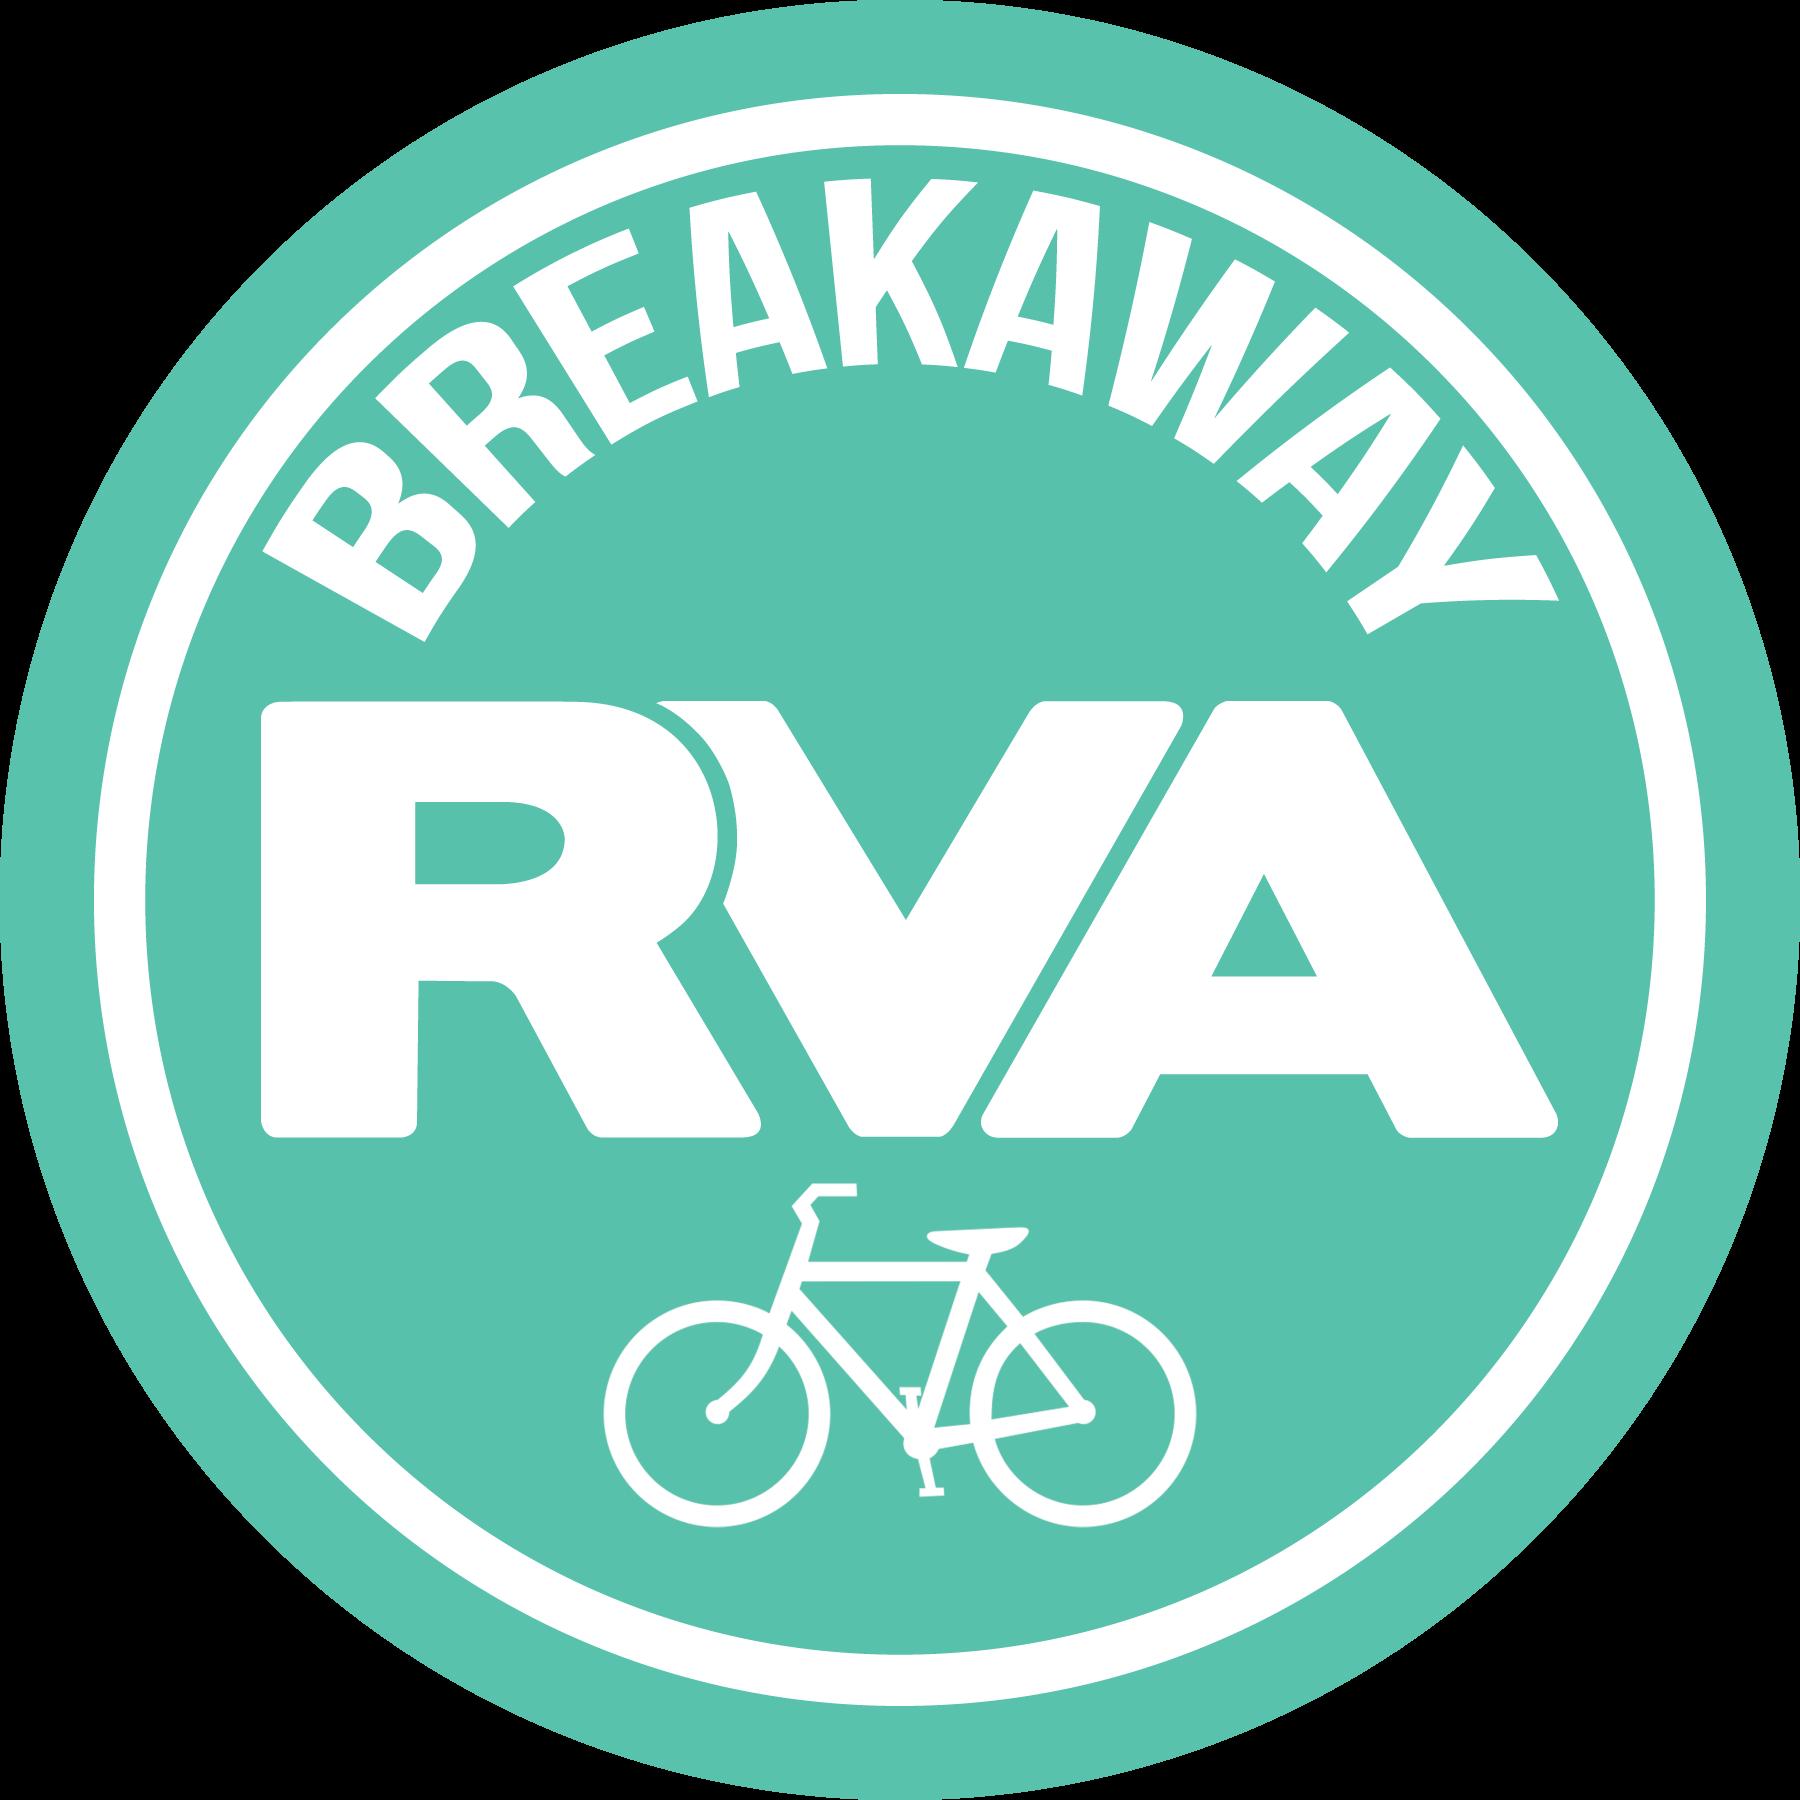 Breakaway RVA